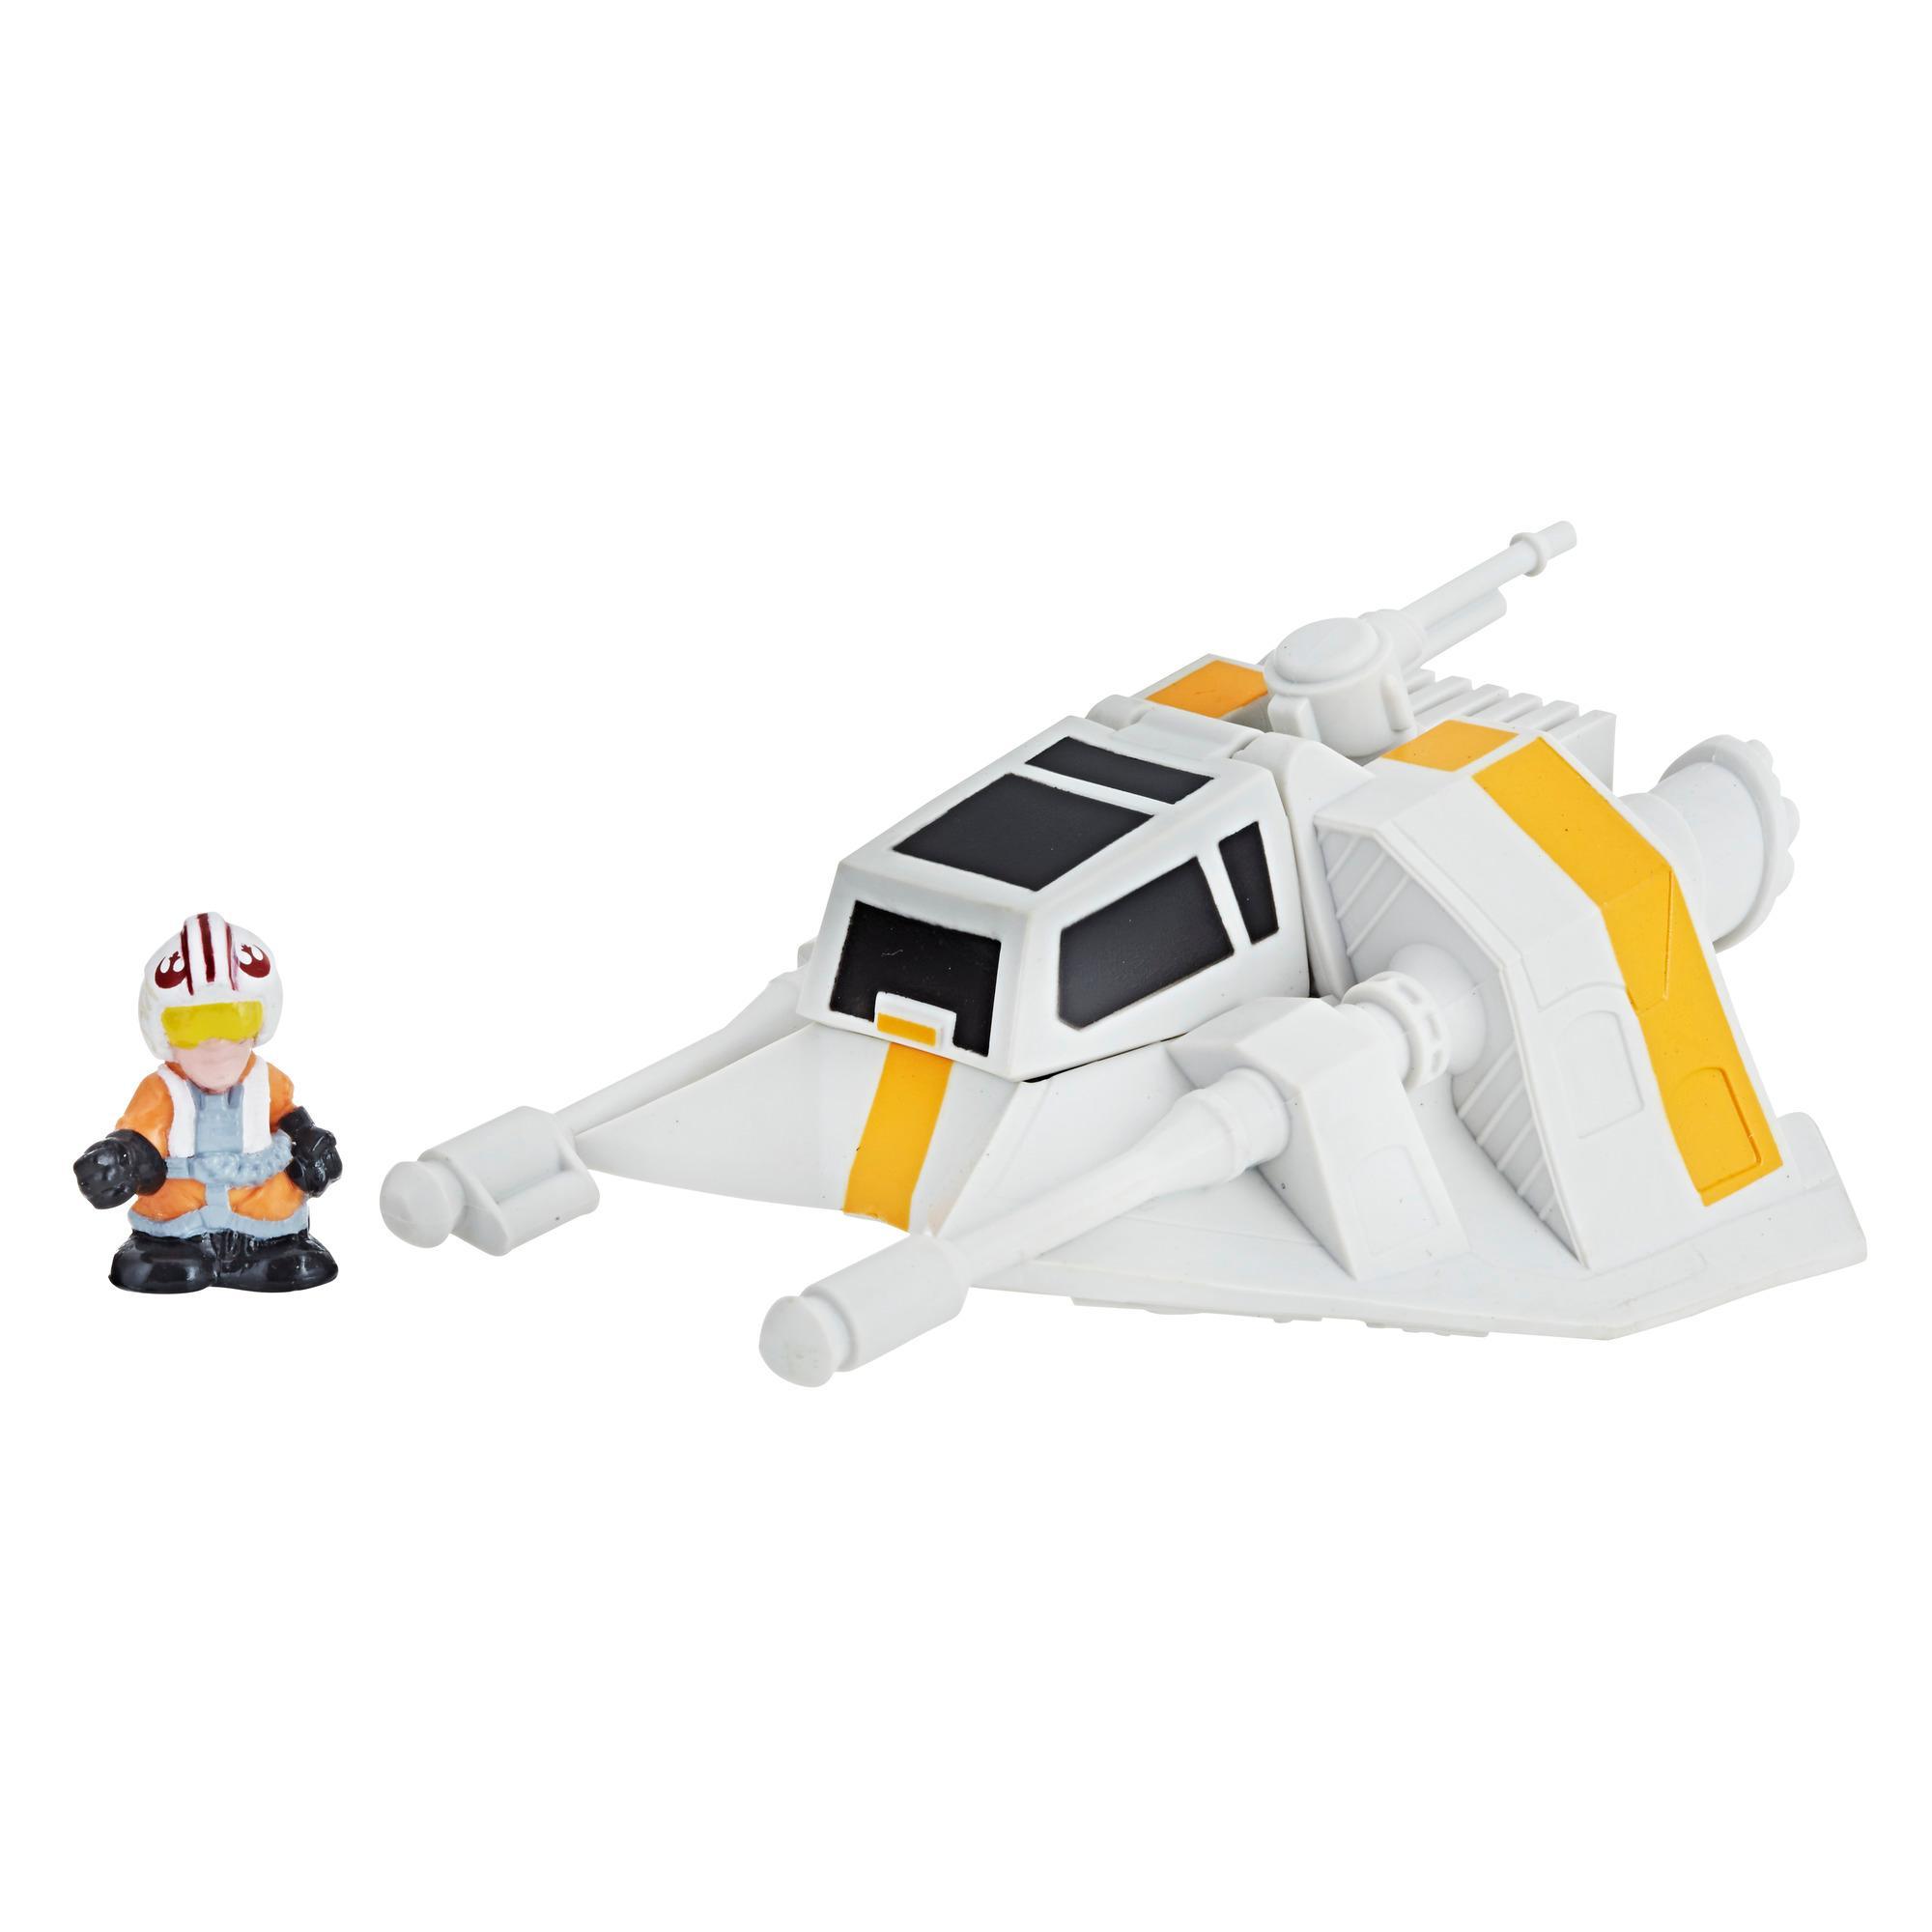 Star Wars Micro Force - Snowspeeder & Luke Skywalker